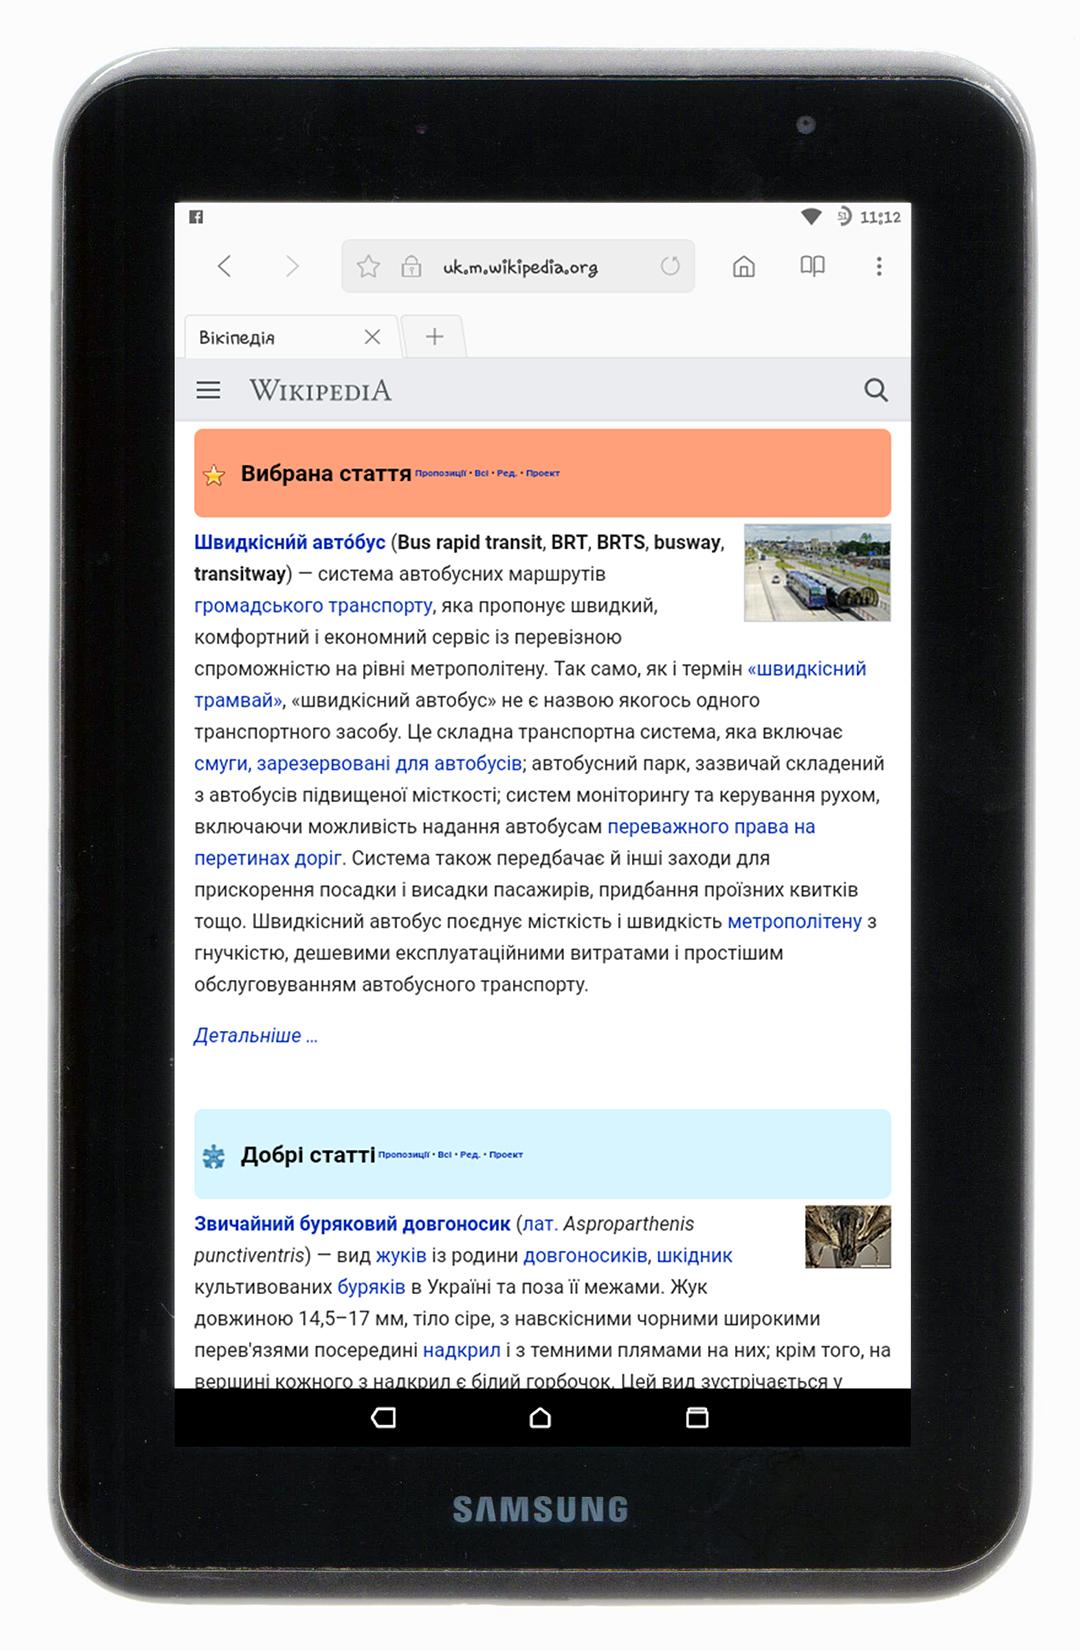 samsung tablets wikipedia